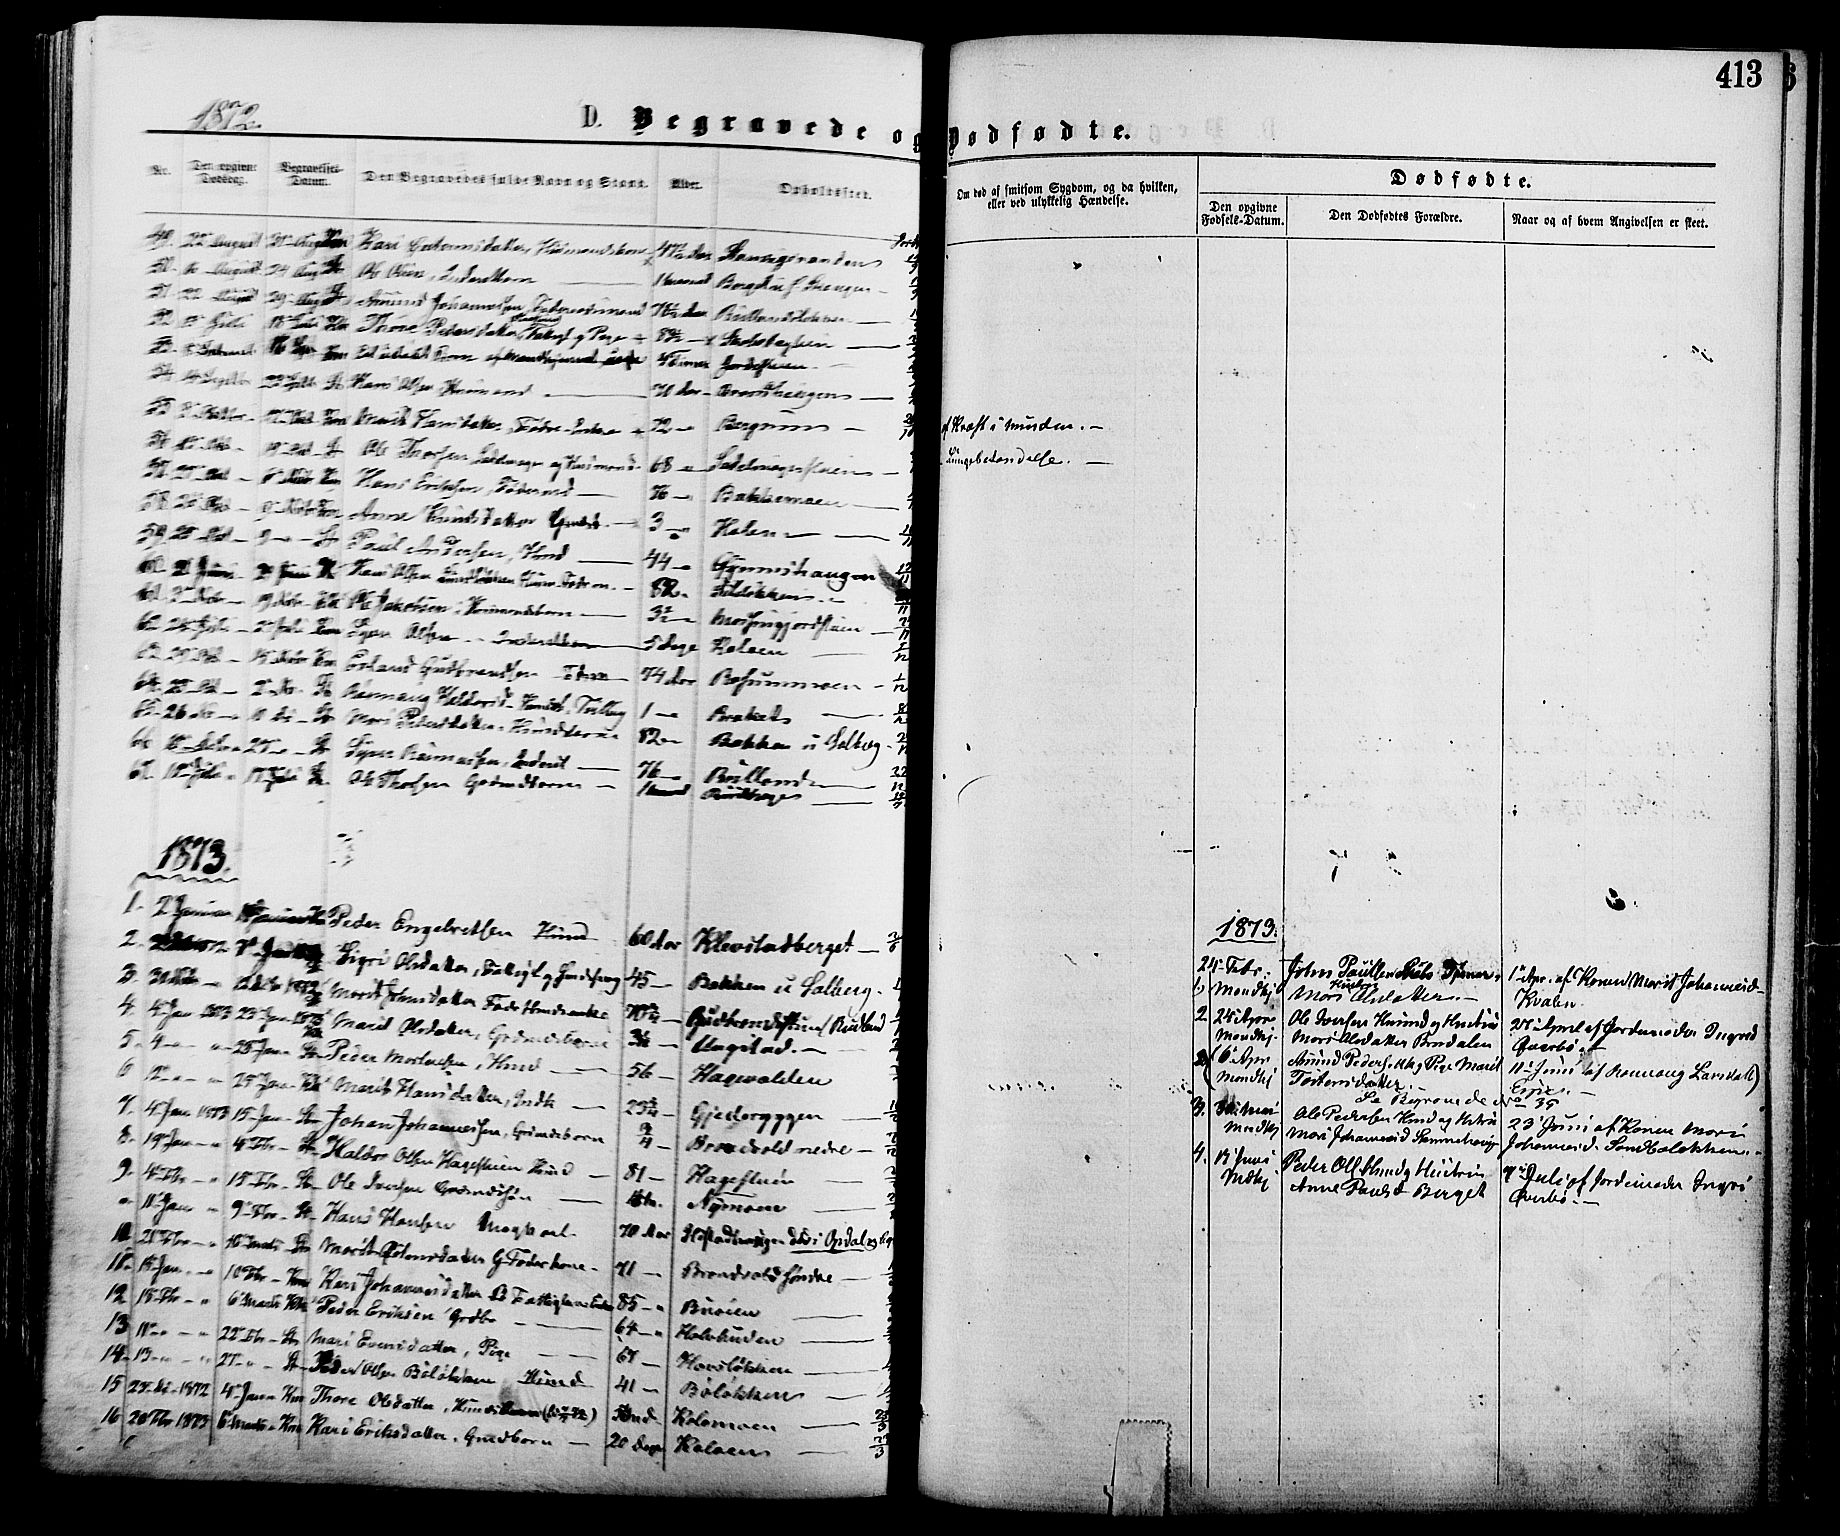 SAH, Nord-Fron prestekontor, Ministerialbok nr. 2, 1865-1883, s. 413